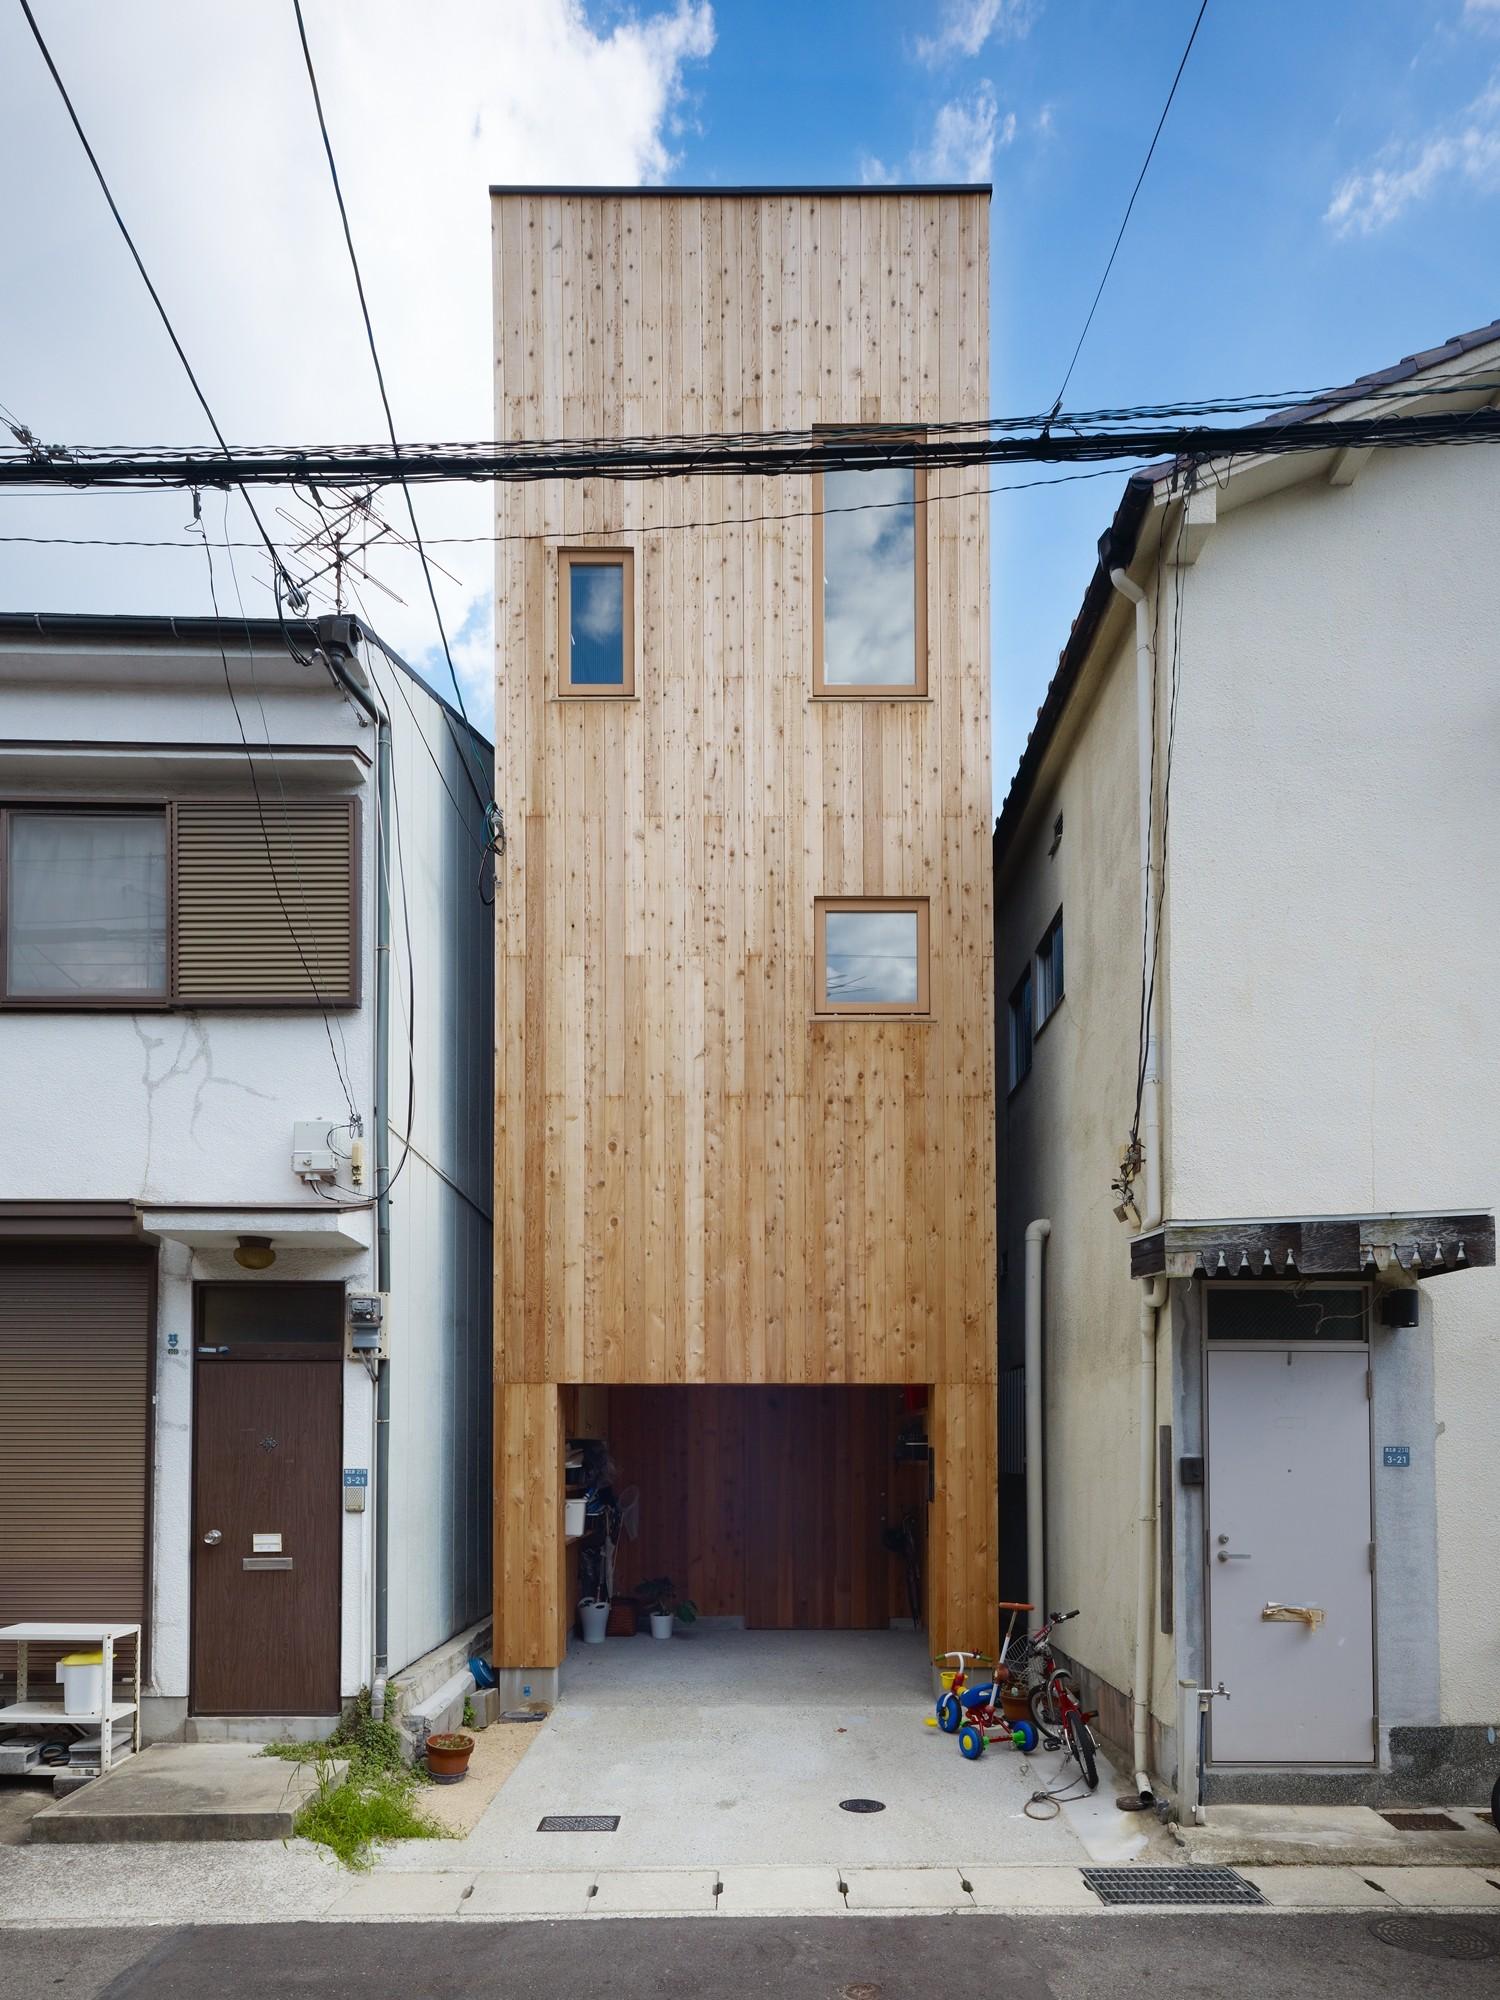 Casa en Nada / Fujiwarramuro Architects